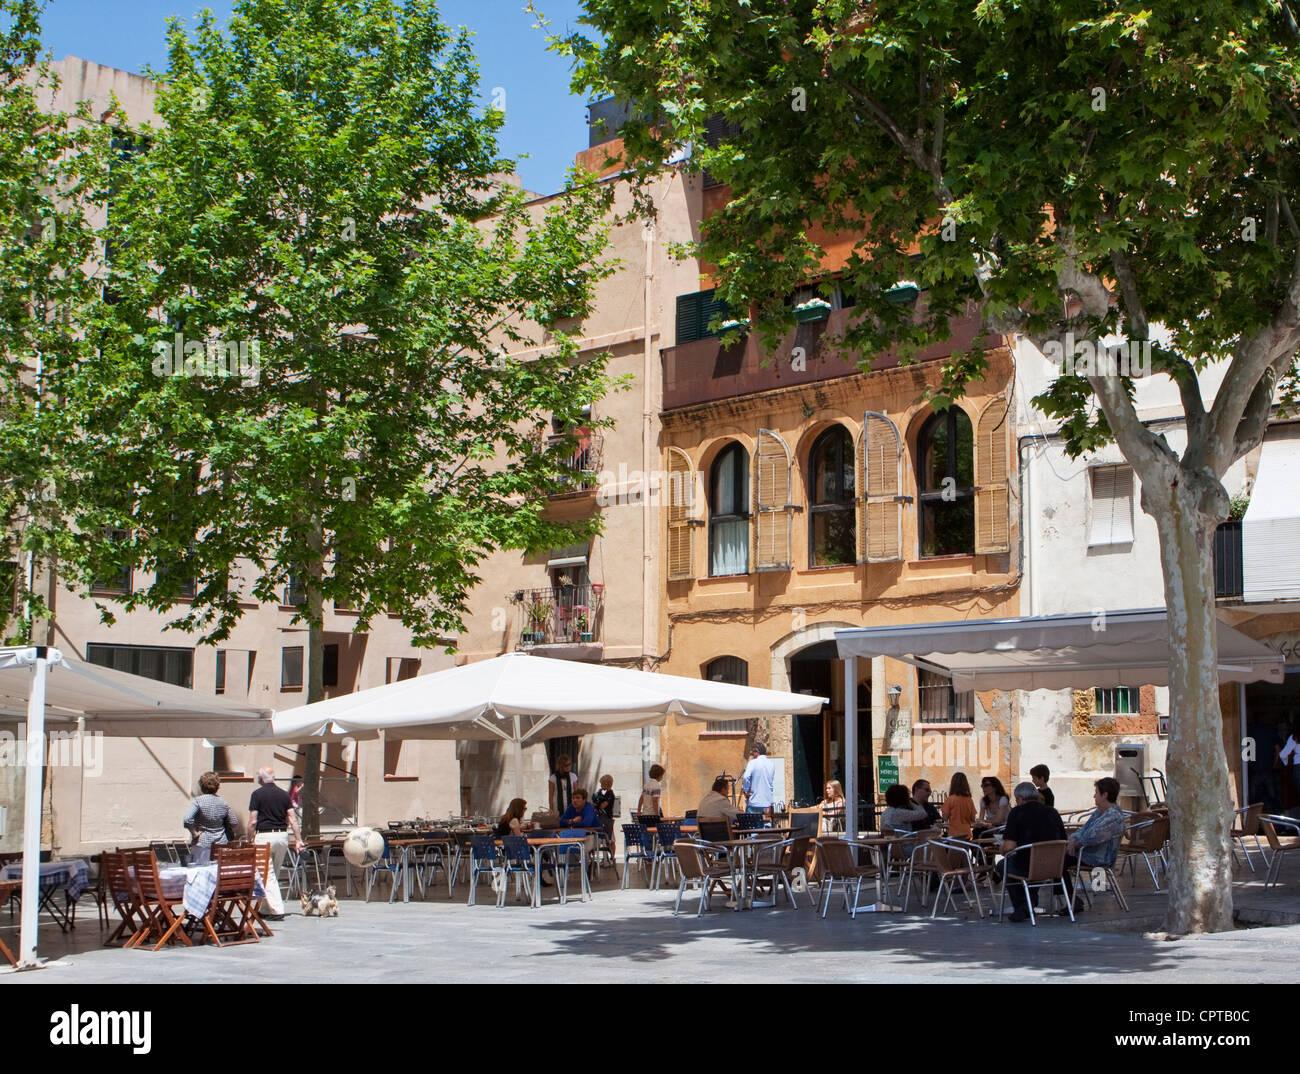 Pavements Bars Bistros in Tarragona Catalonia Spain - Stock Image